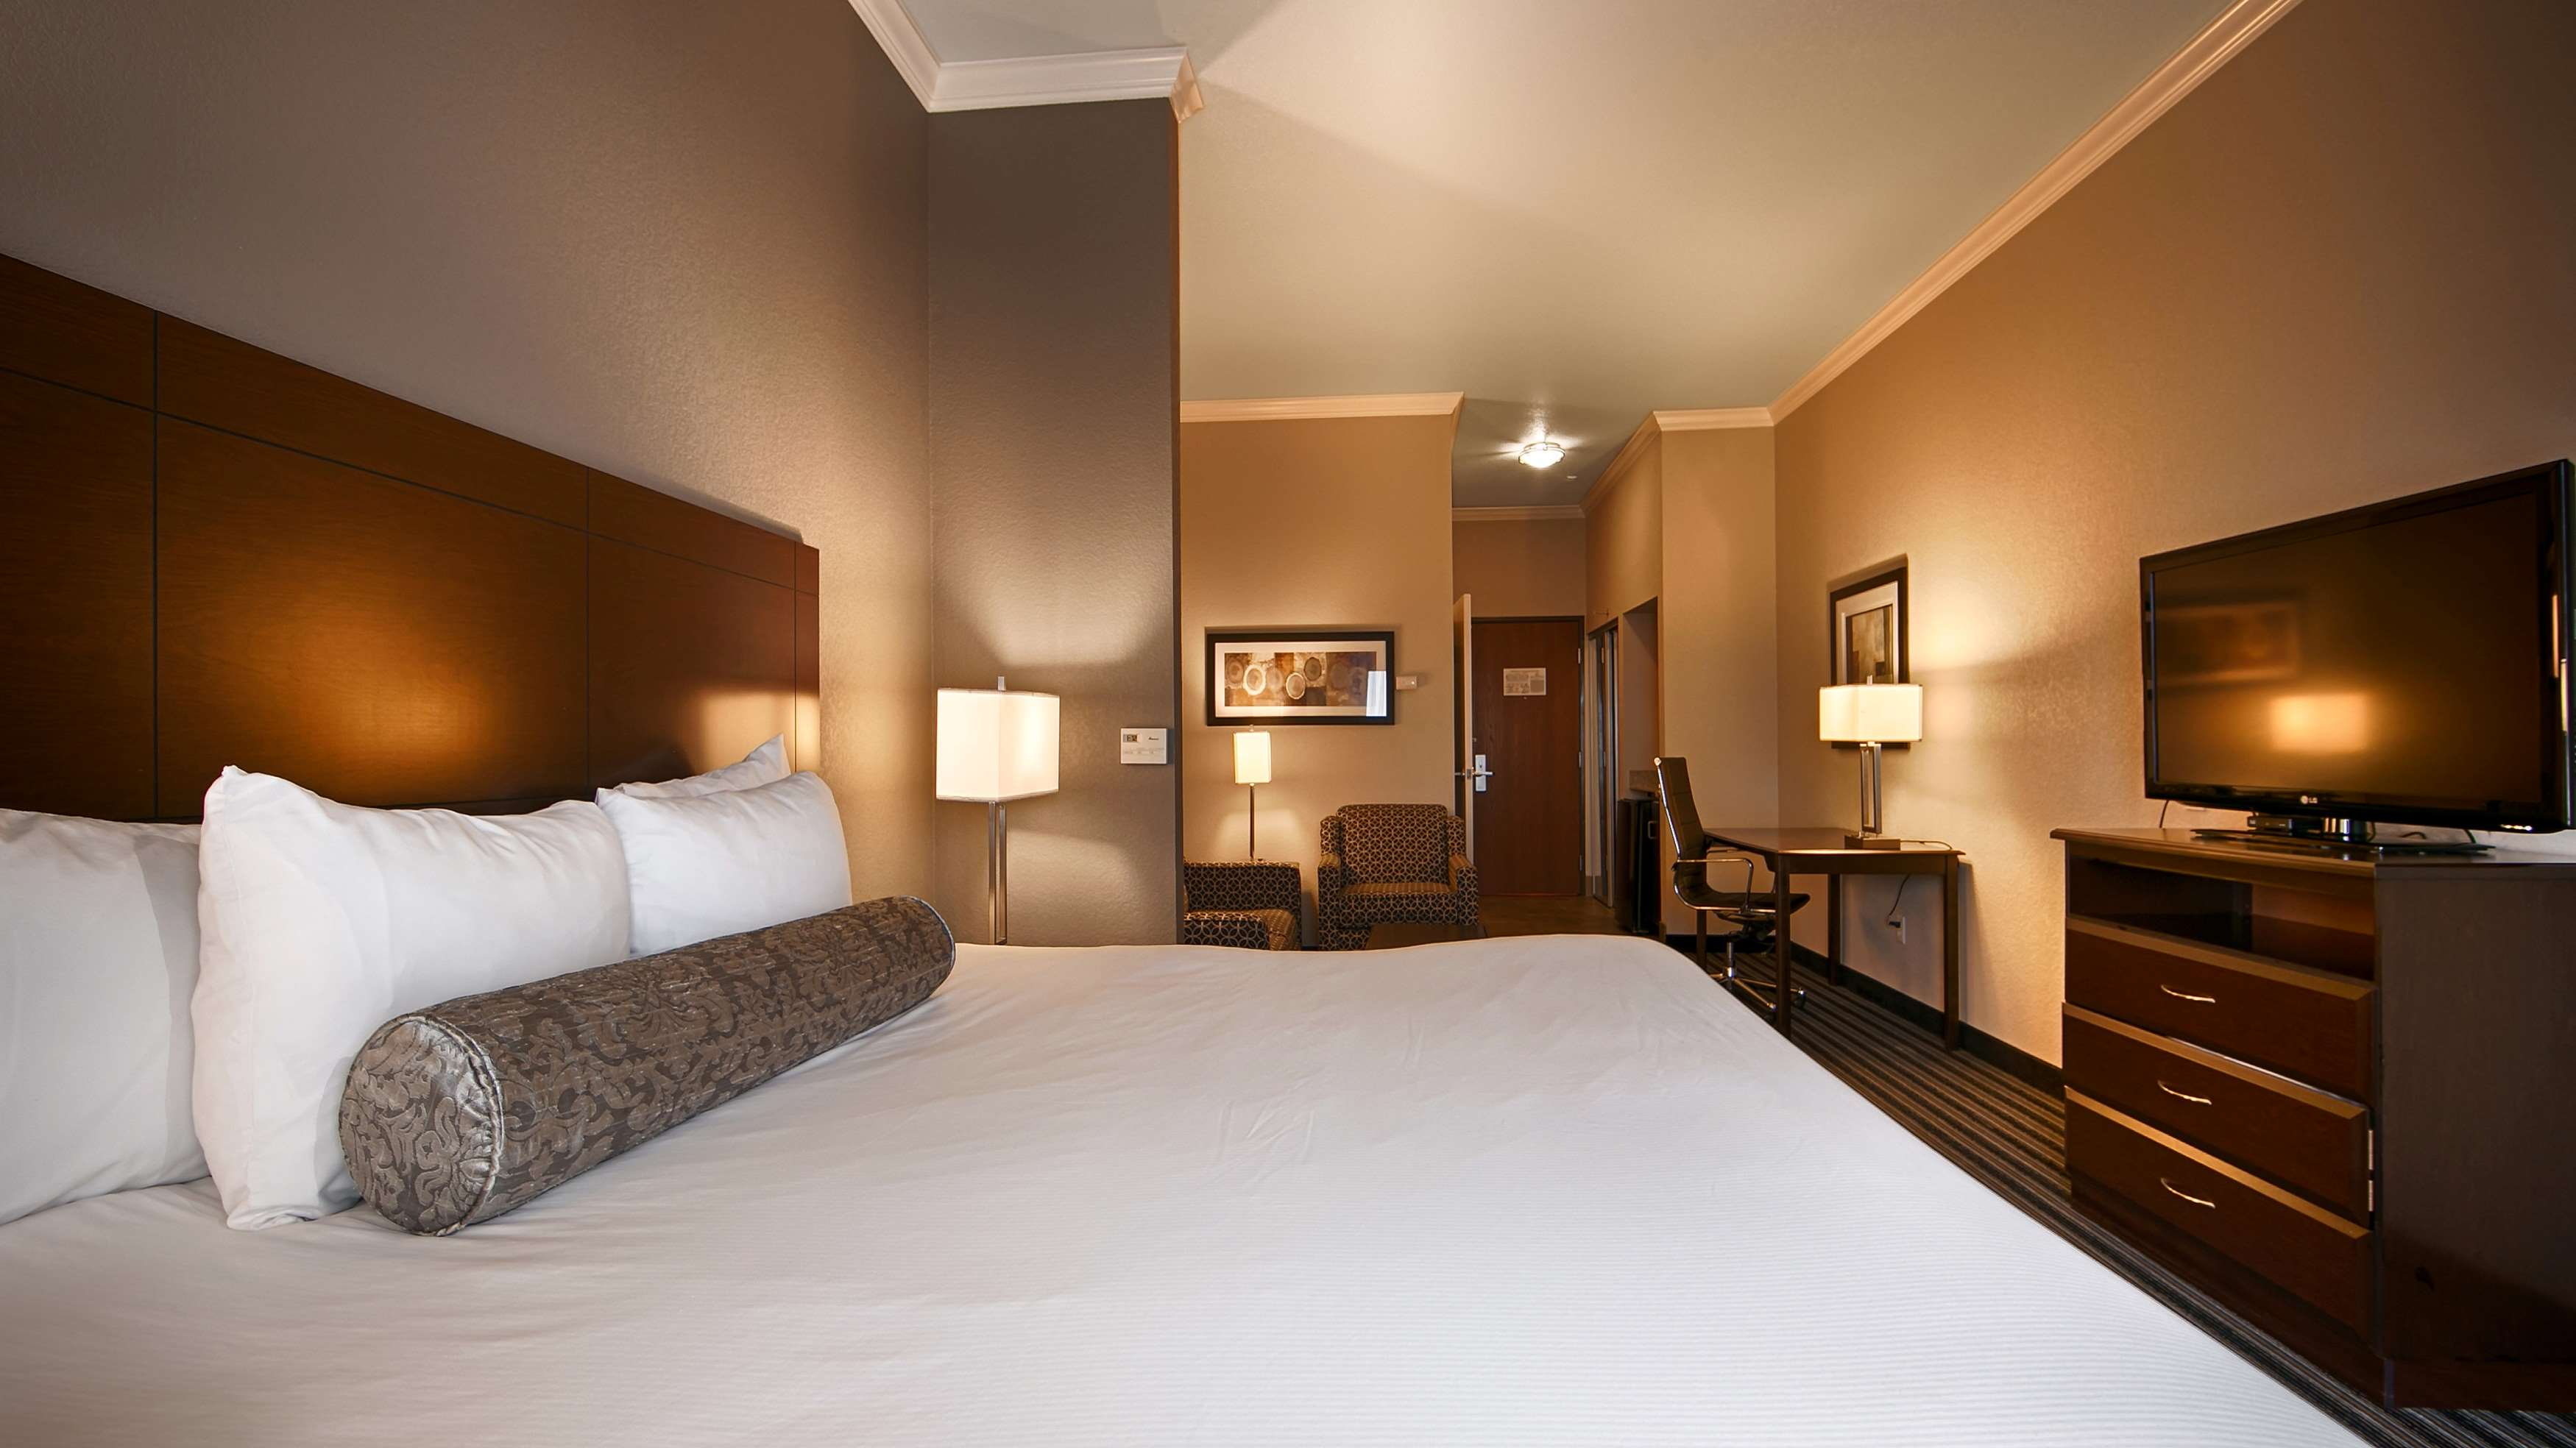 Best Western Plus Austin Airport Inn & Suites image 5